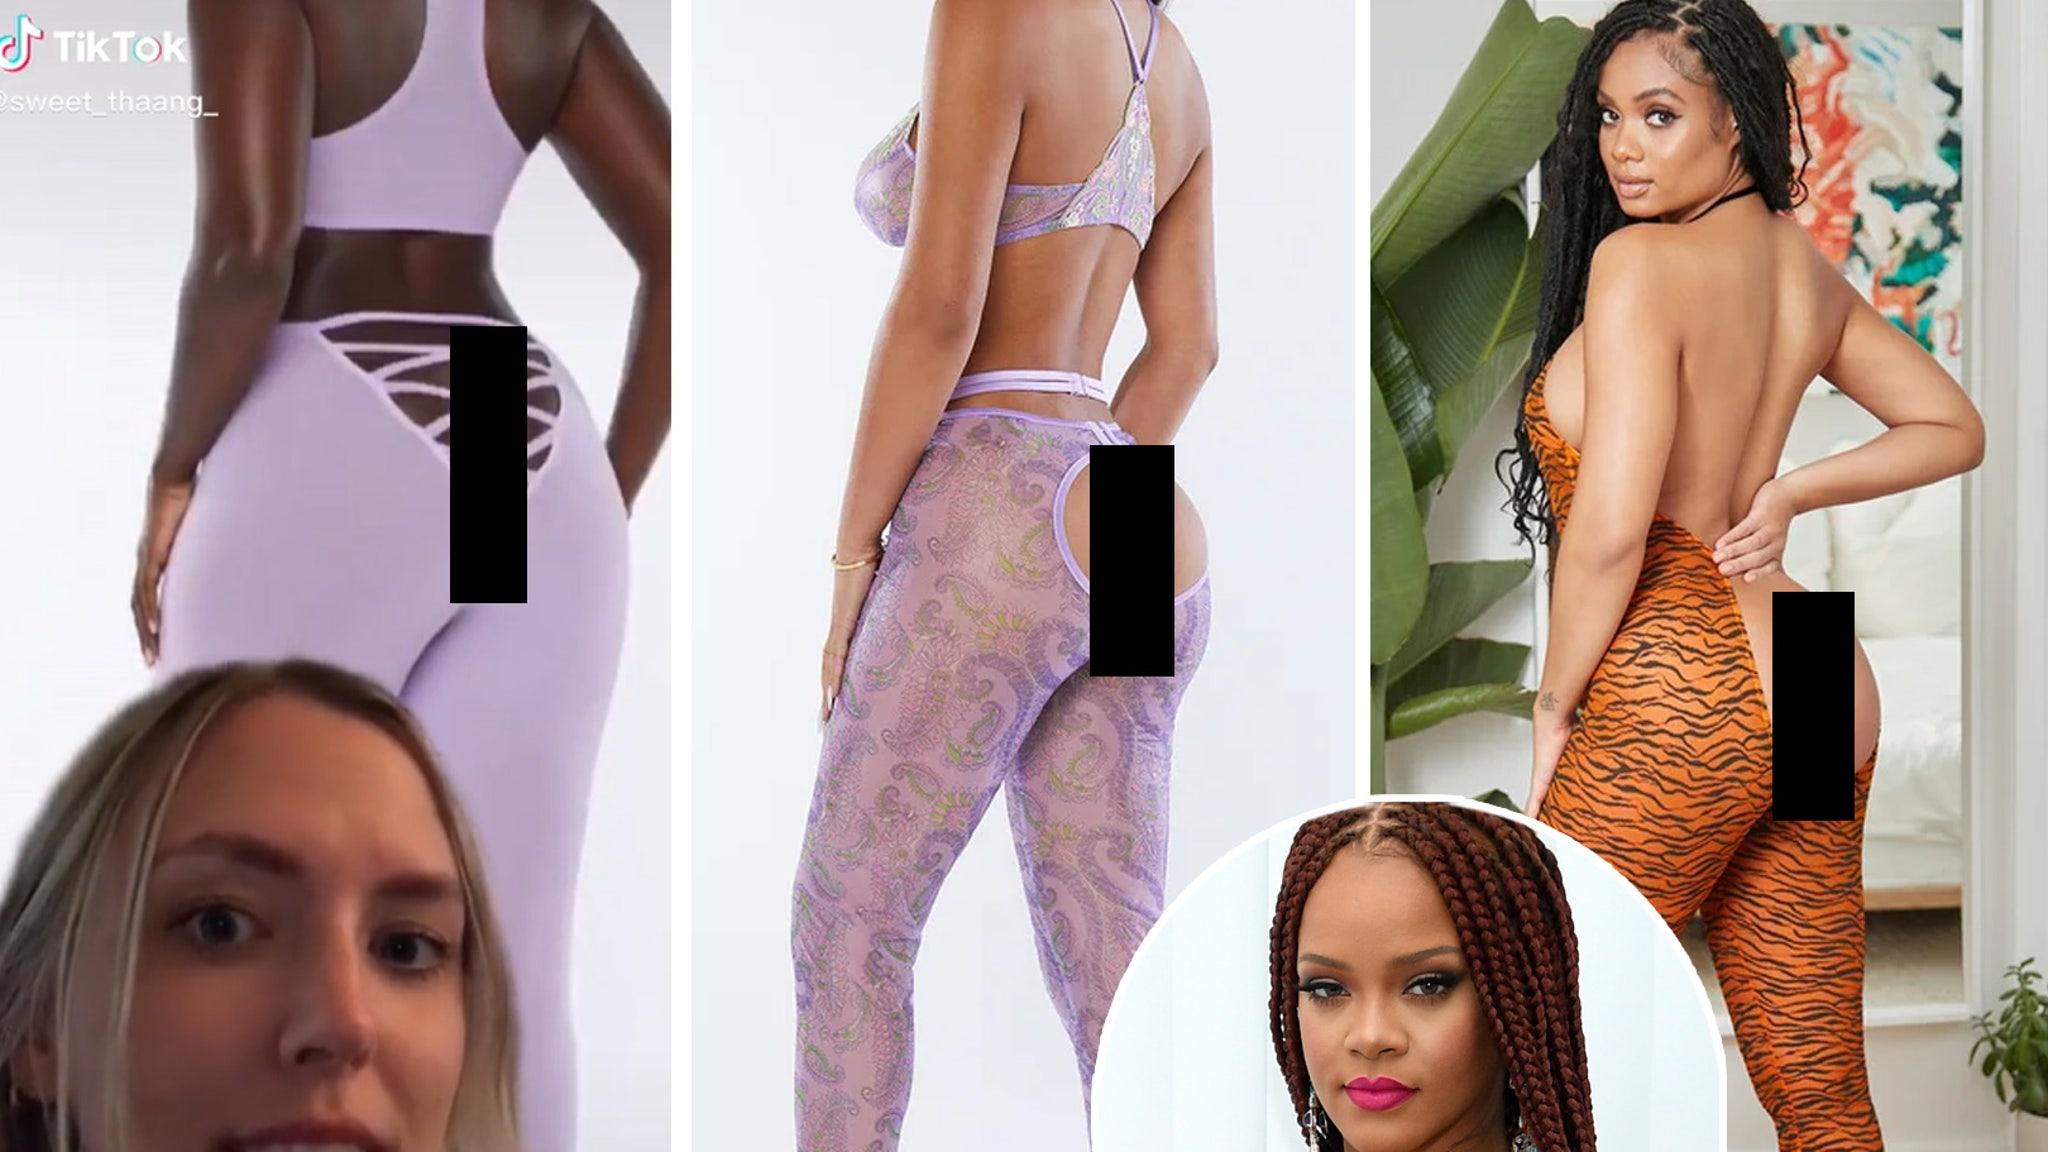 Internet divided by Rihanna's buttless leggings